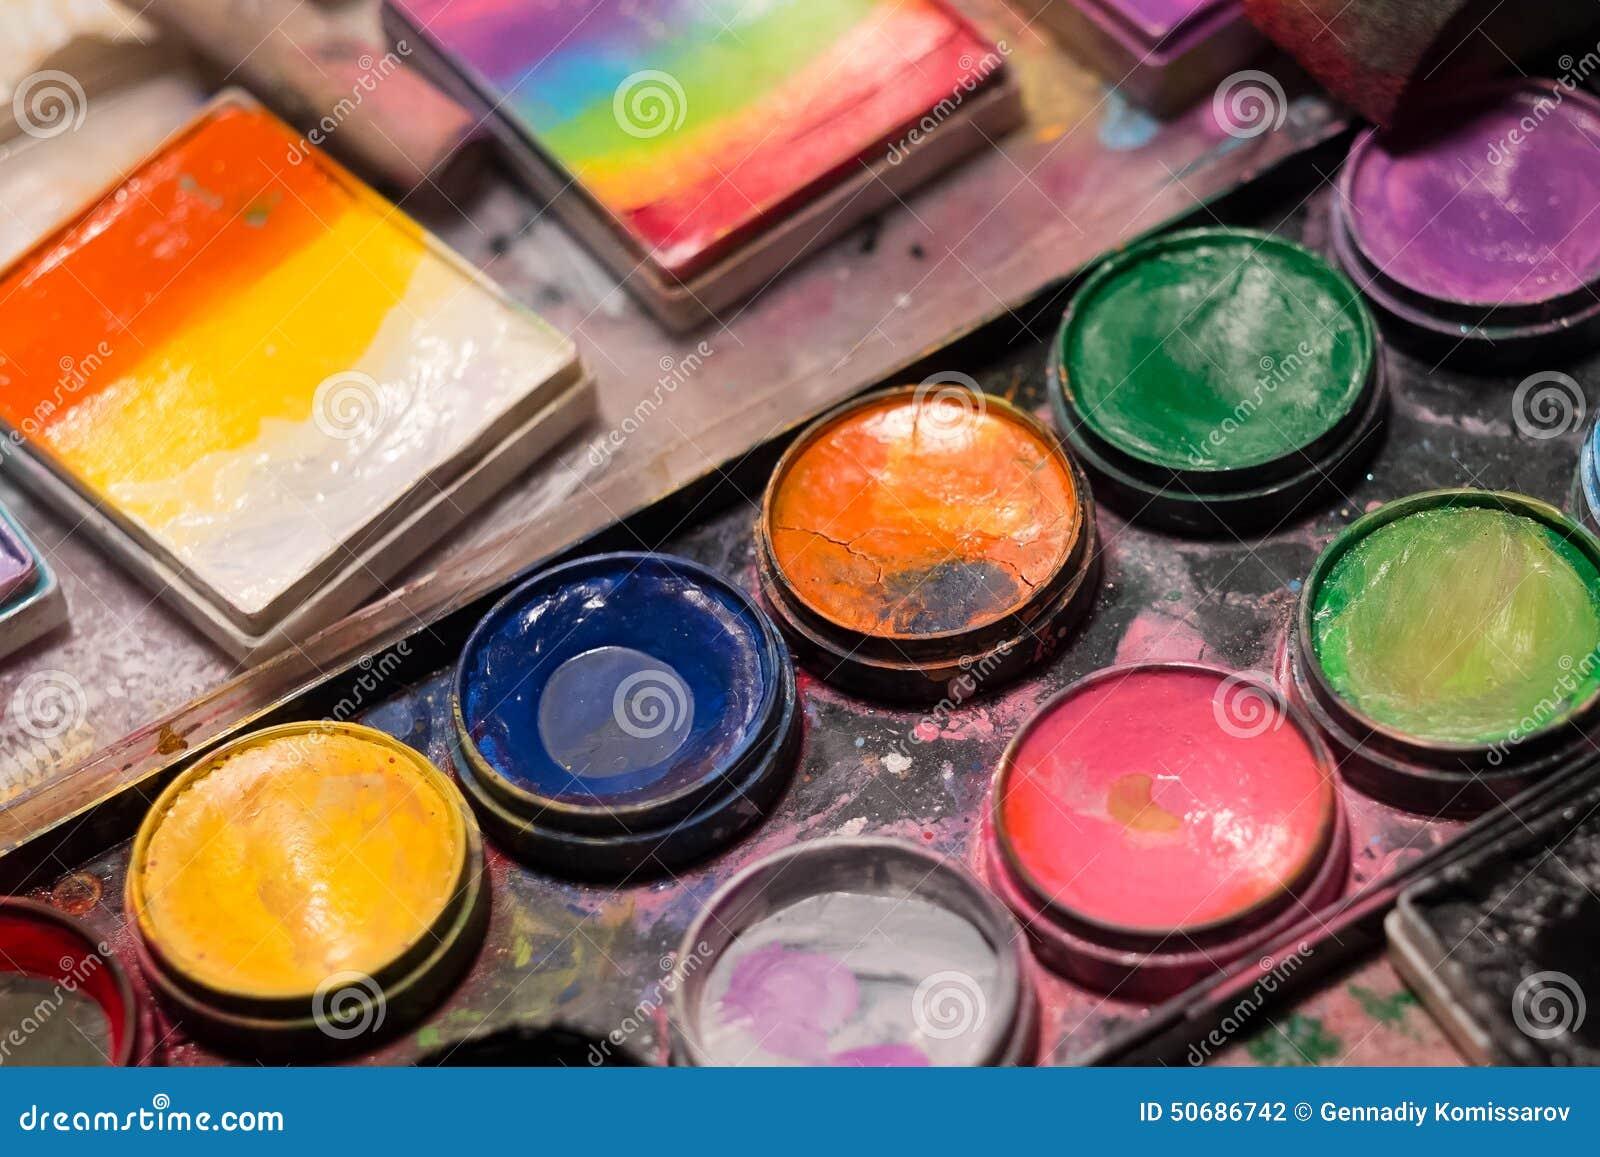 Download 调色板 库存照片. 图片 包括有 示例, 油漆, 的treadled, 美妙地, 技艺家, brusher - 50686742